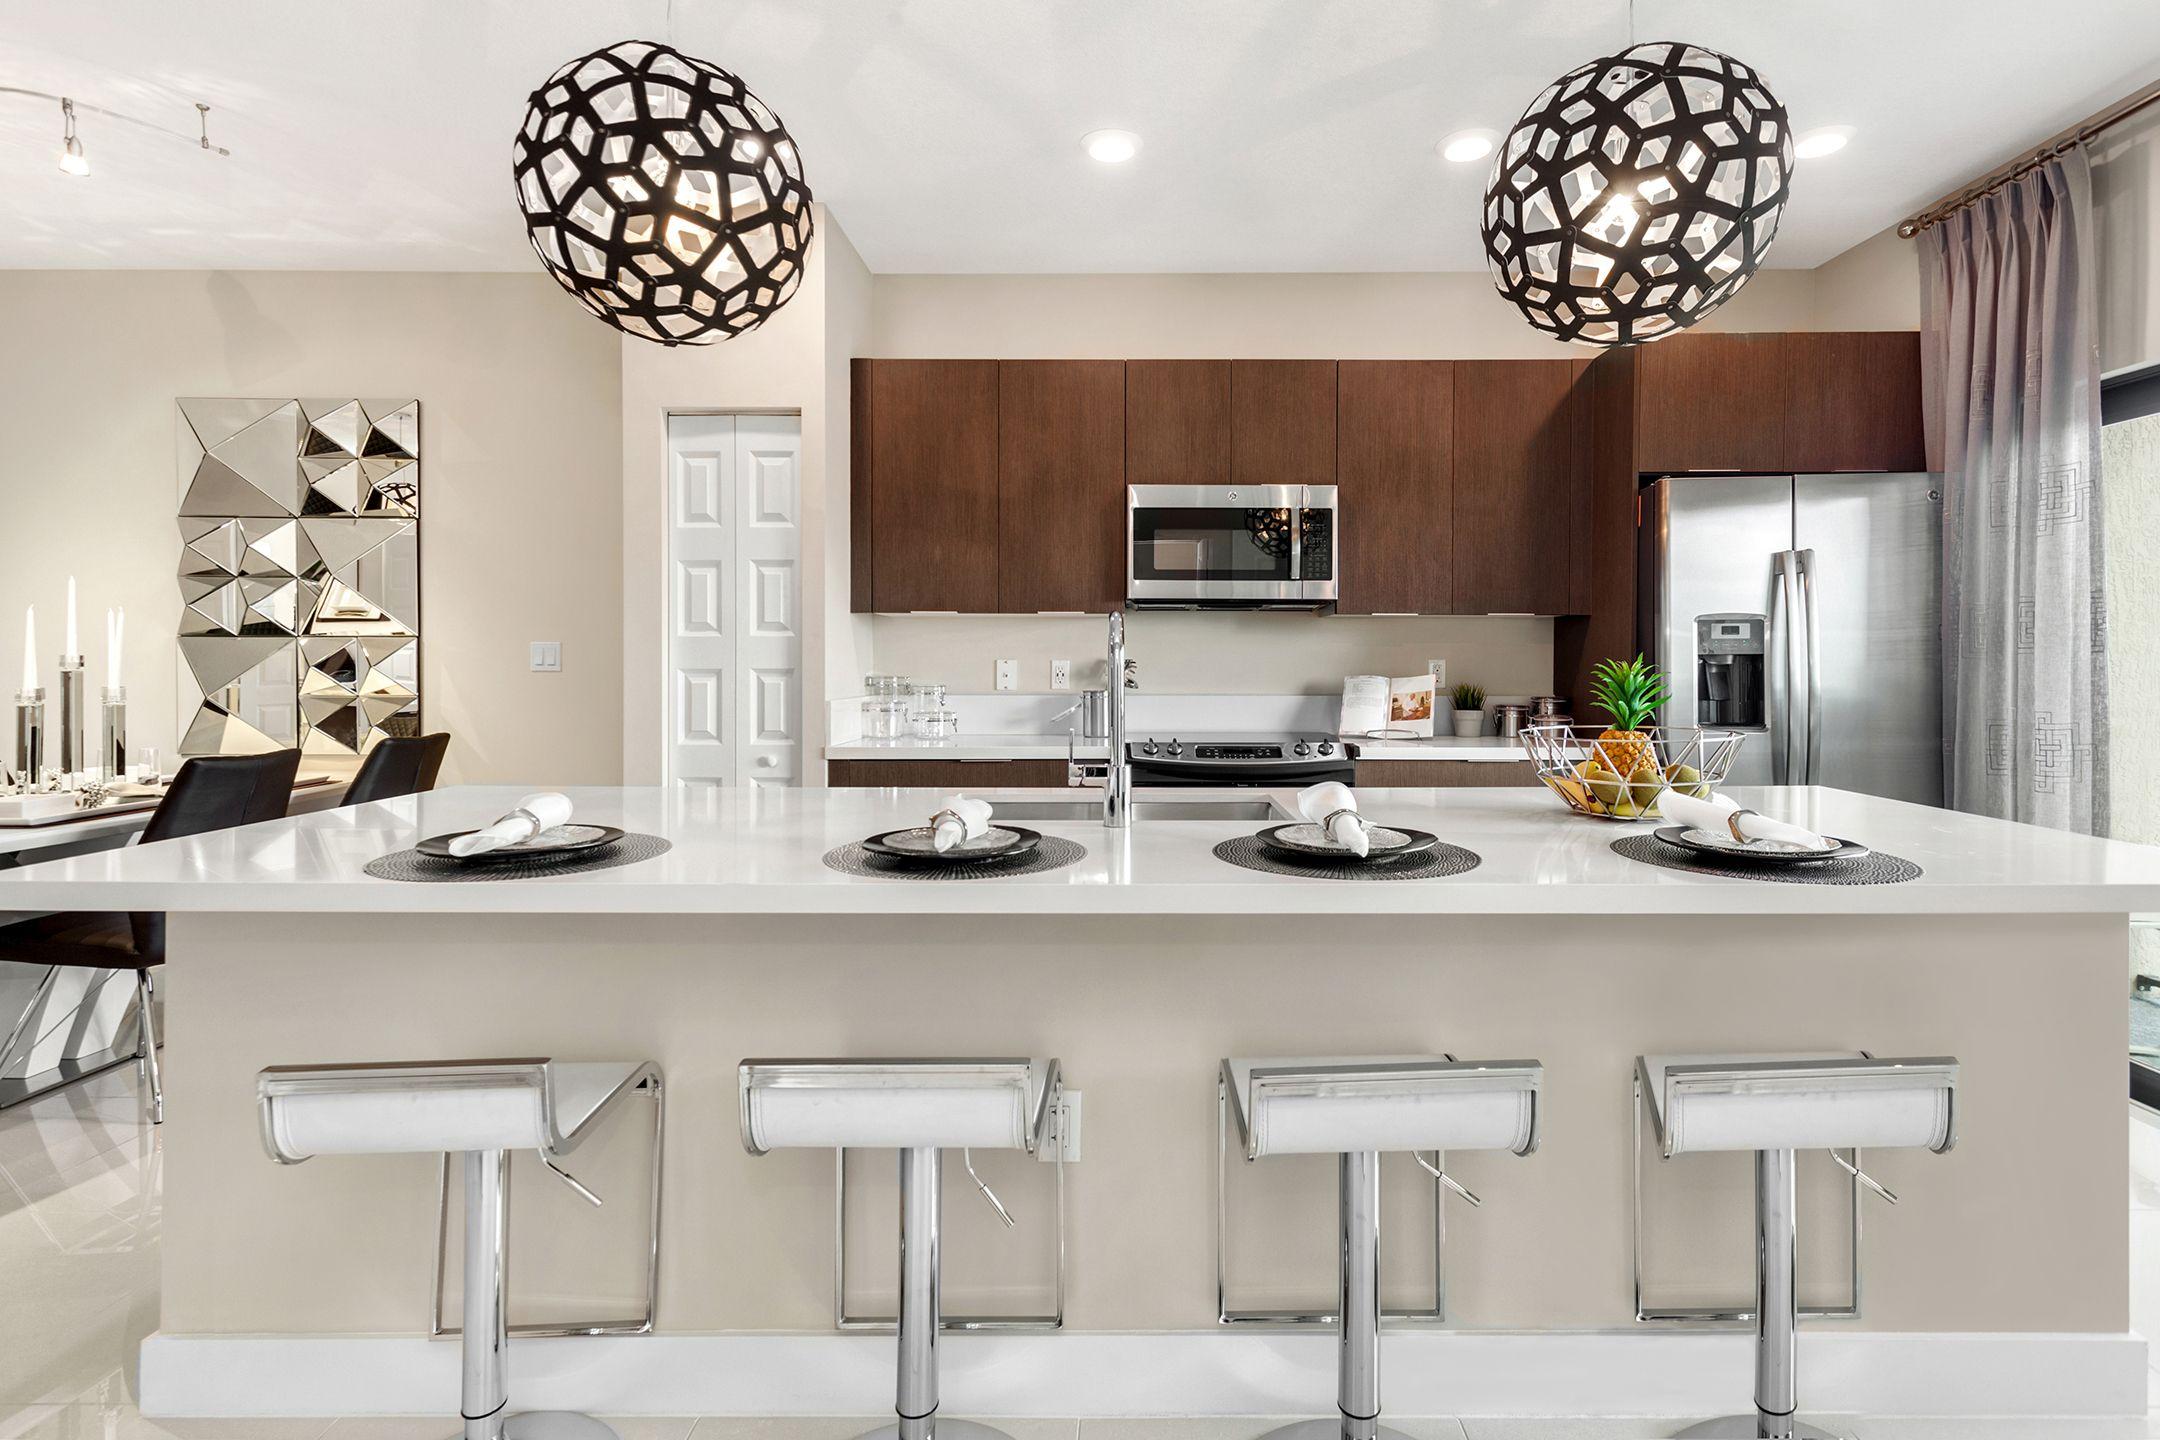 Modern Kitchen Design At Apex In Park Centralu0027s Cascade Home. Brown  Cabinets | Quartz Countertop